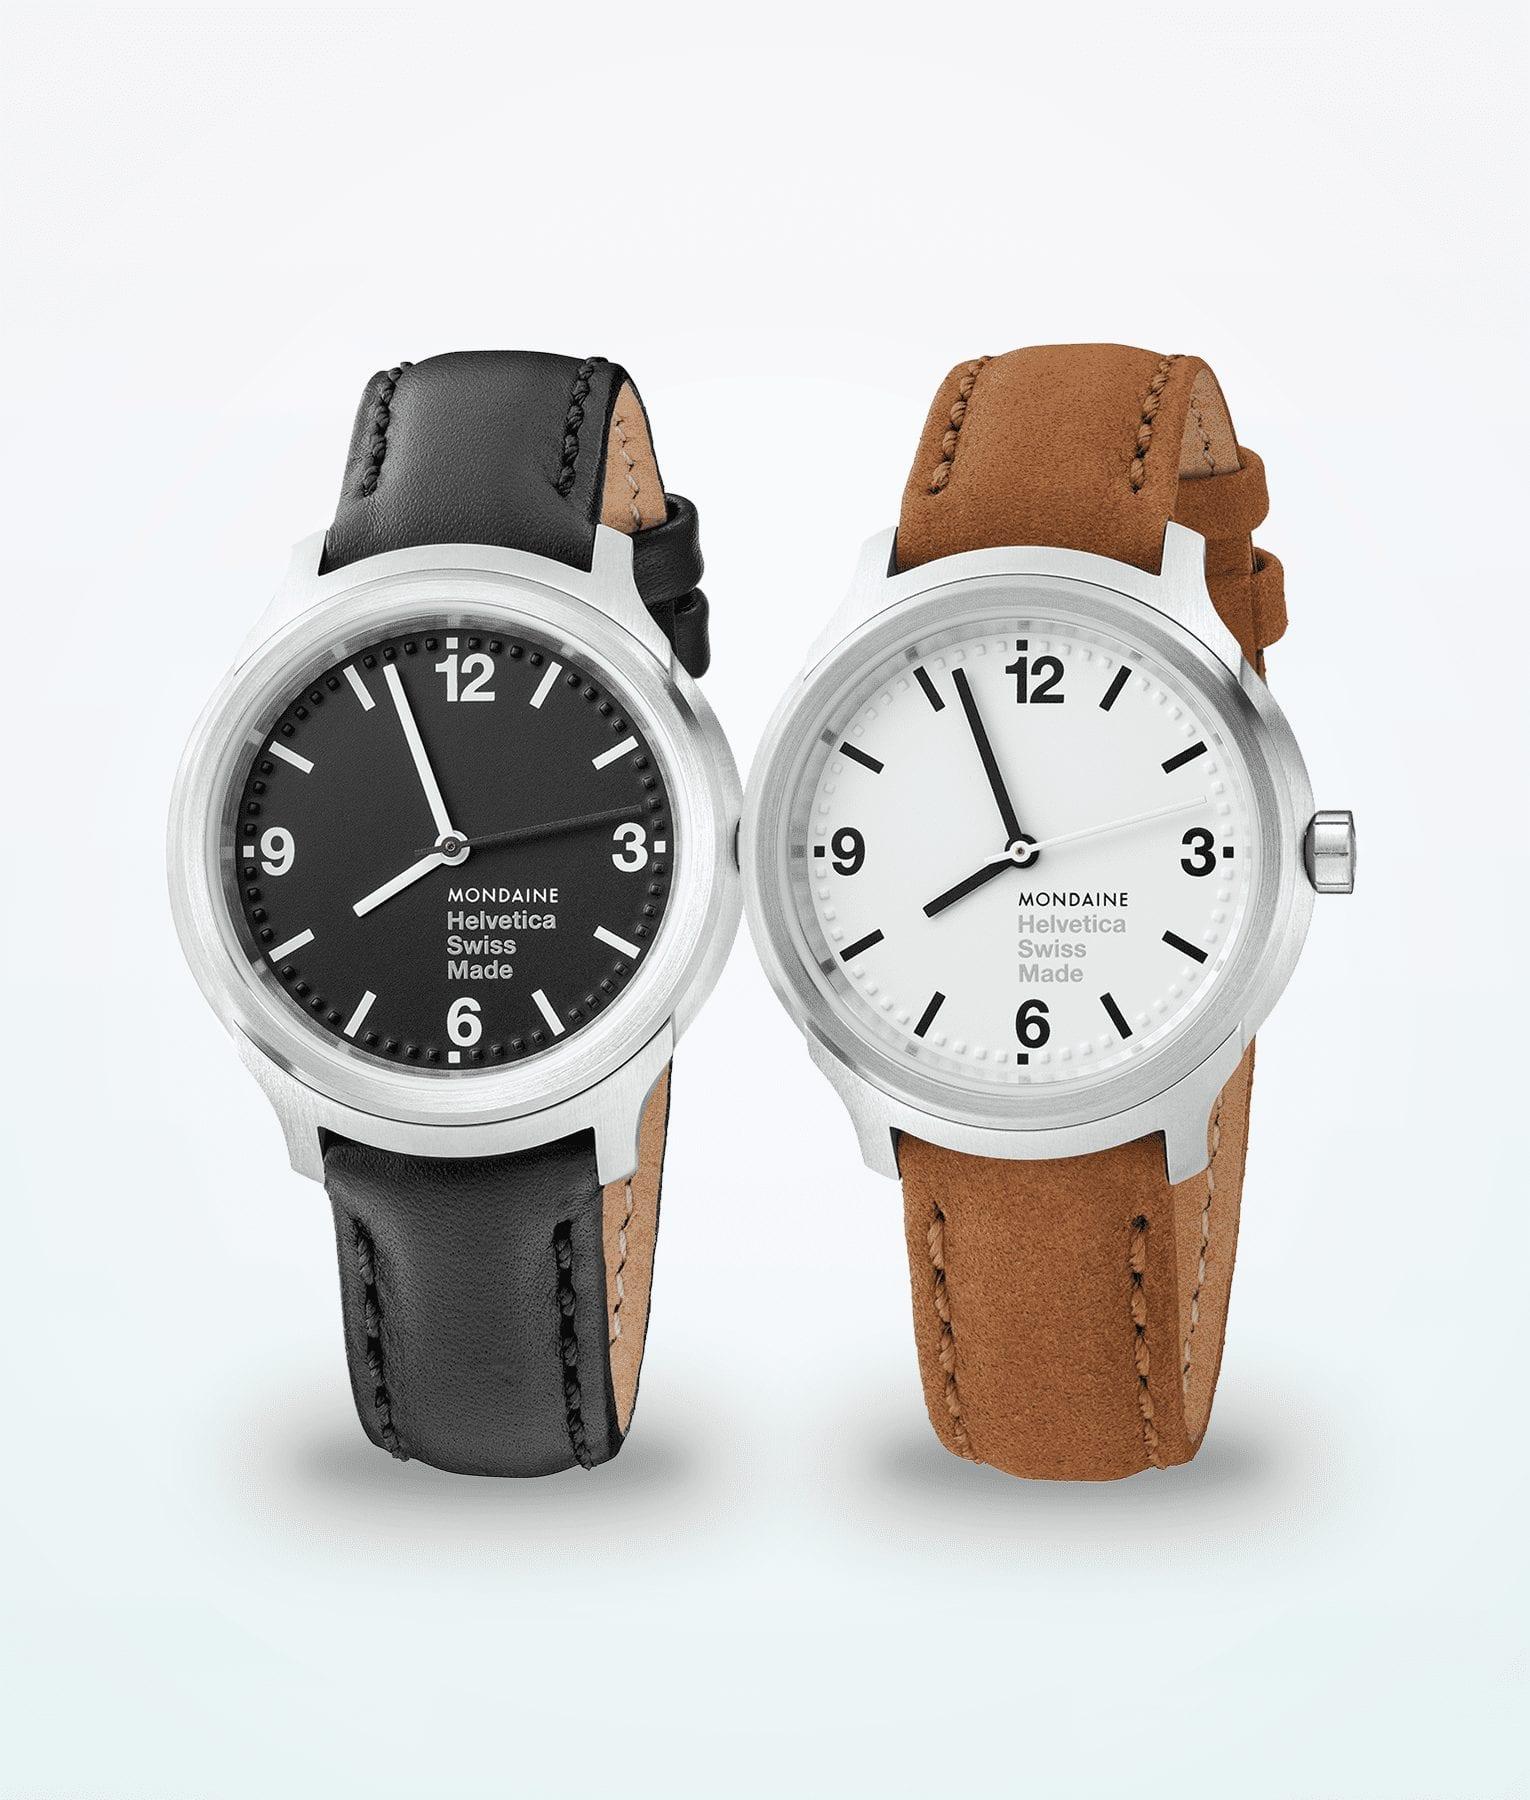 mondaine-helvetica-no1-bold-women-reloj de pulsera